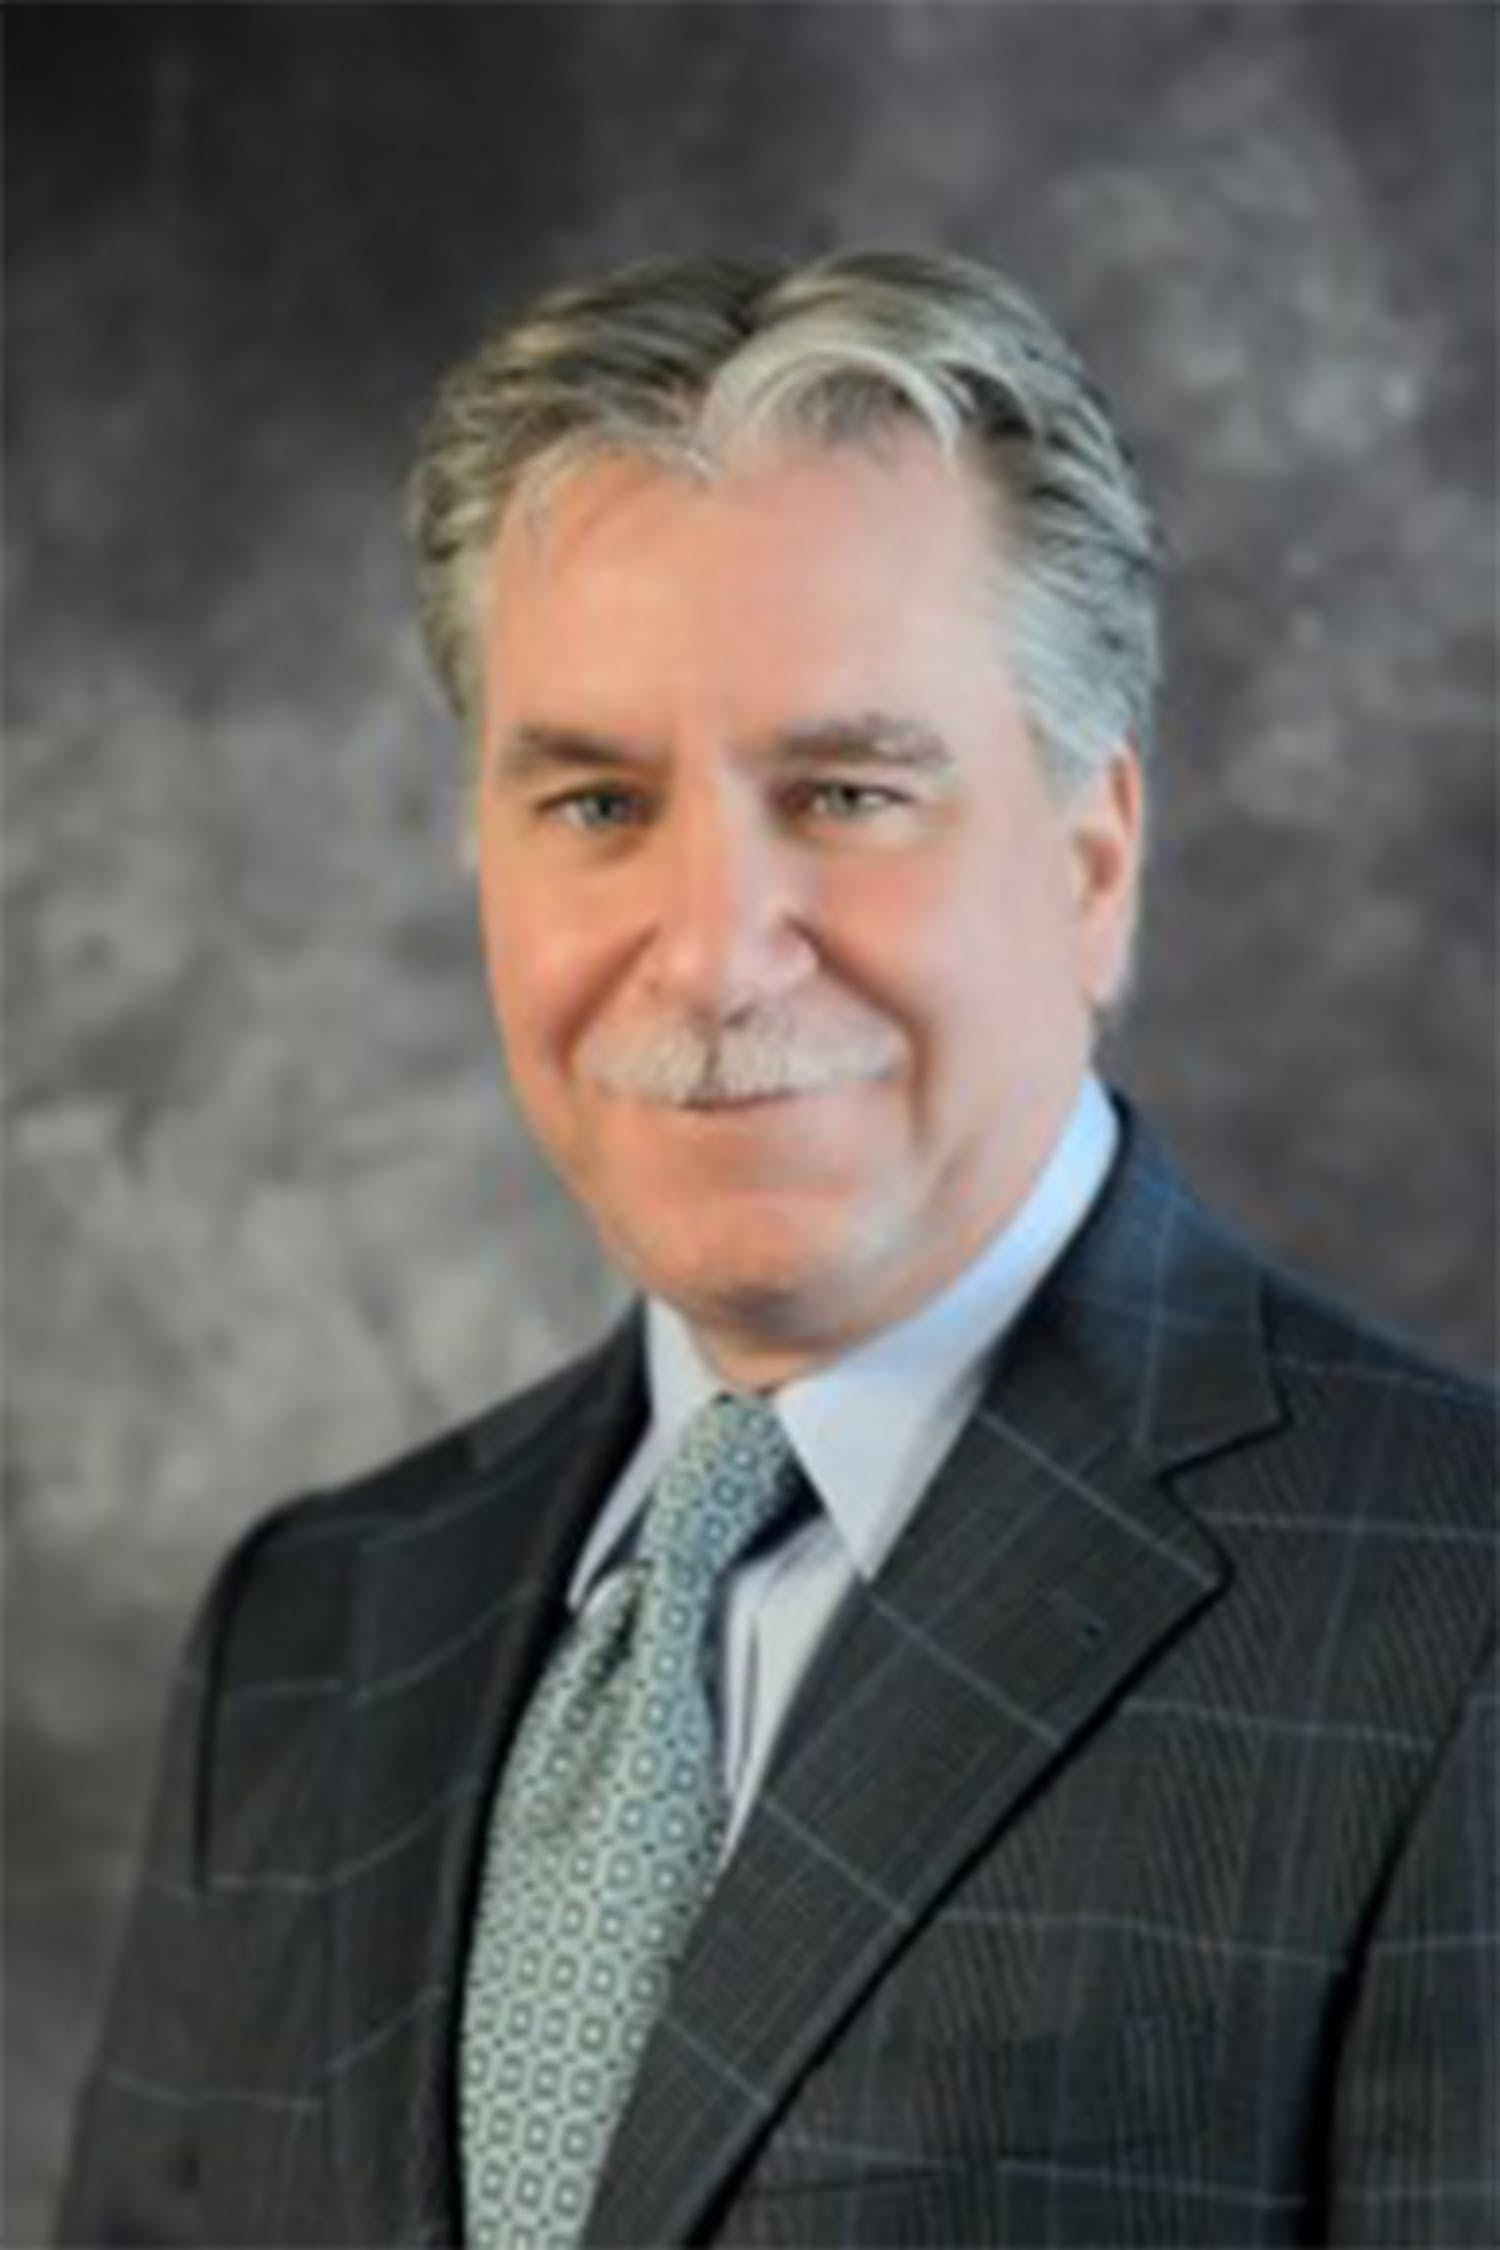 Dan J. Naef, President of Rise Communities LLC